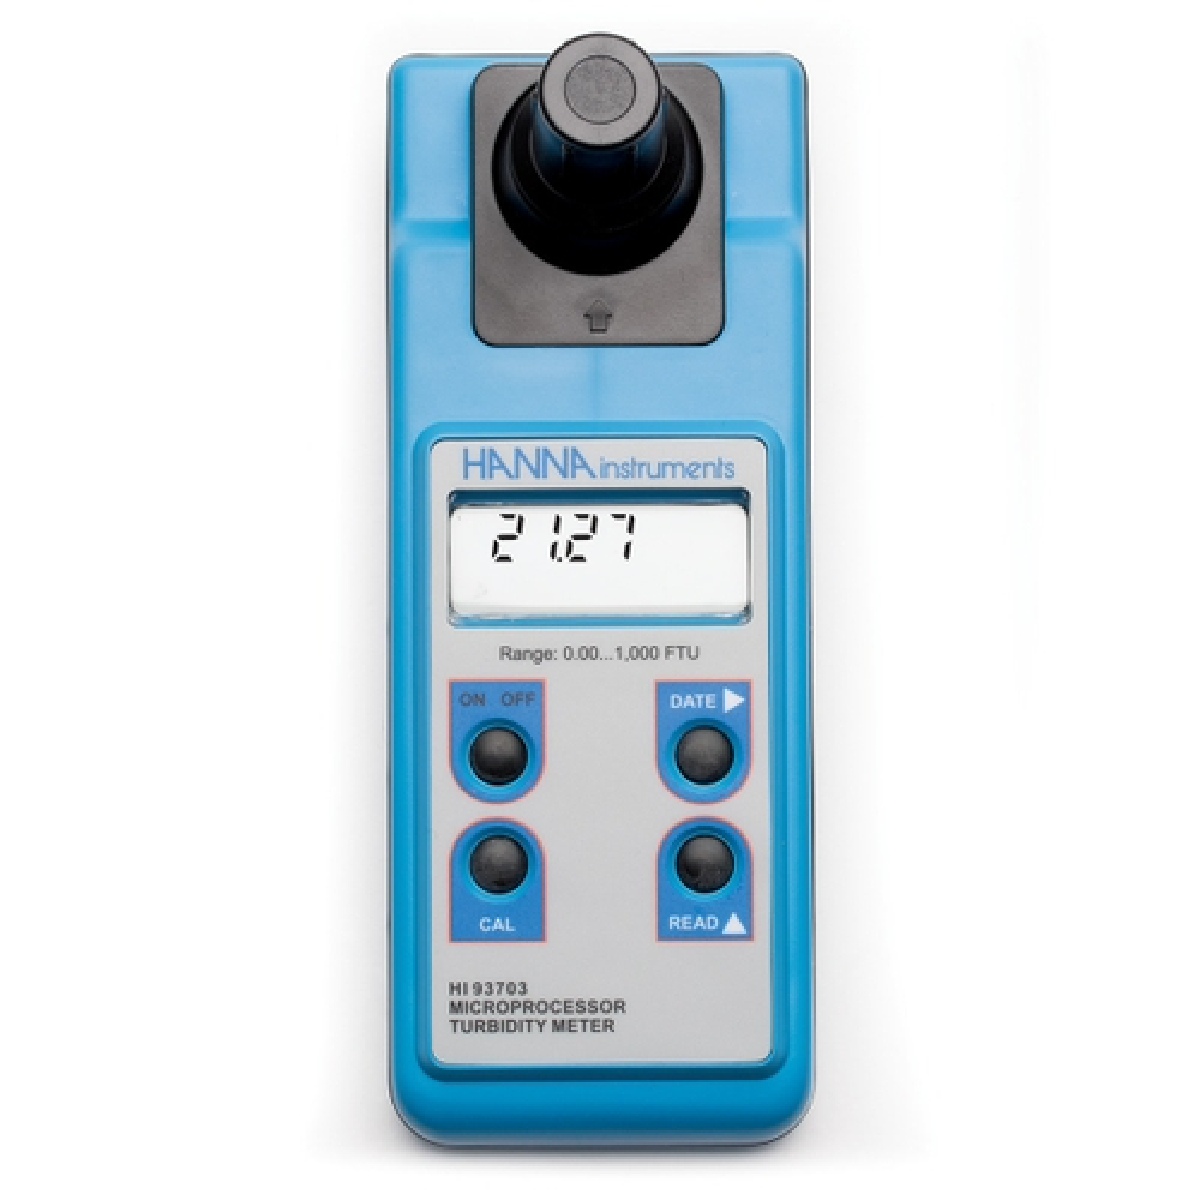 HI93703 Portable Turbidity Meter ISO Compliant